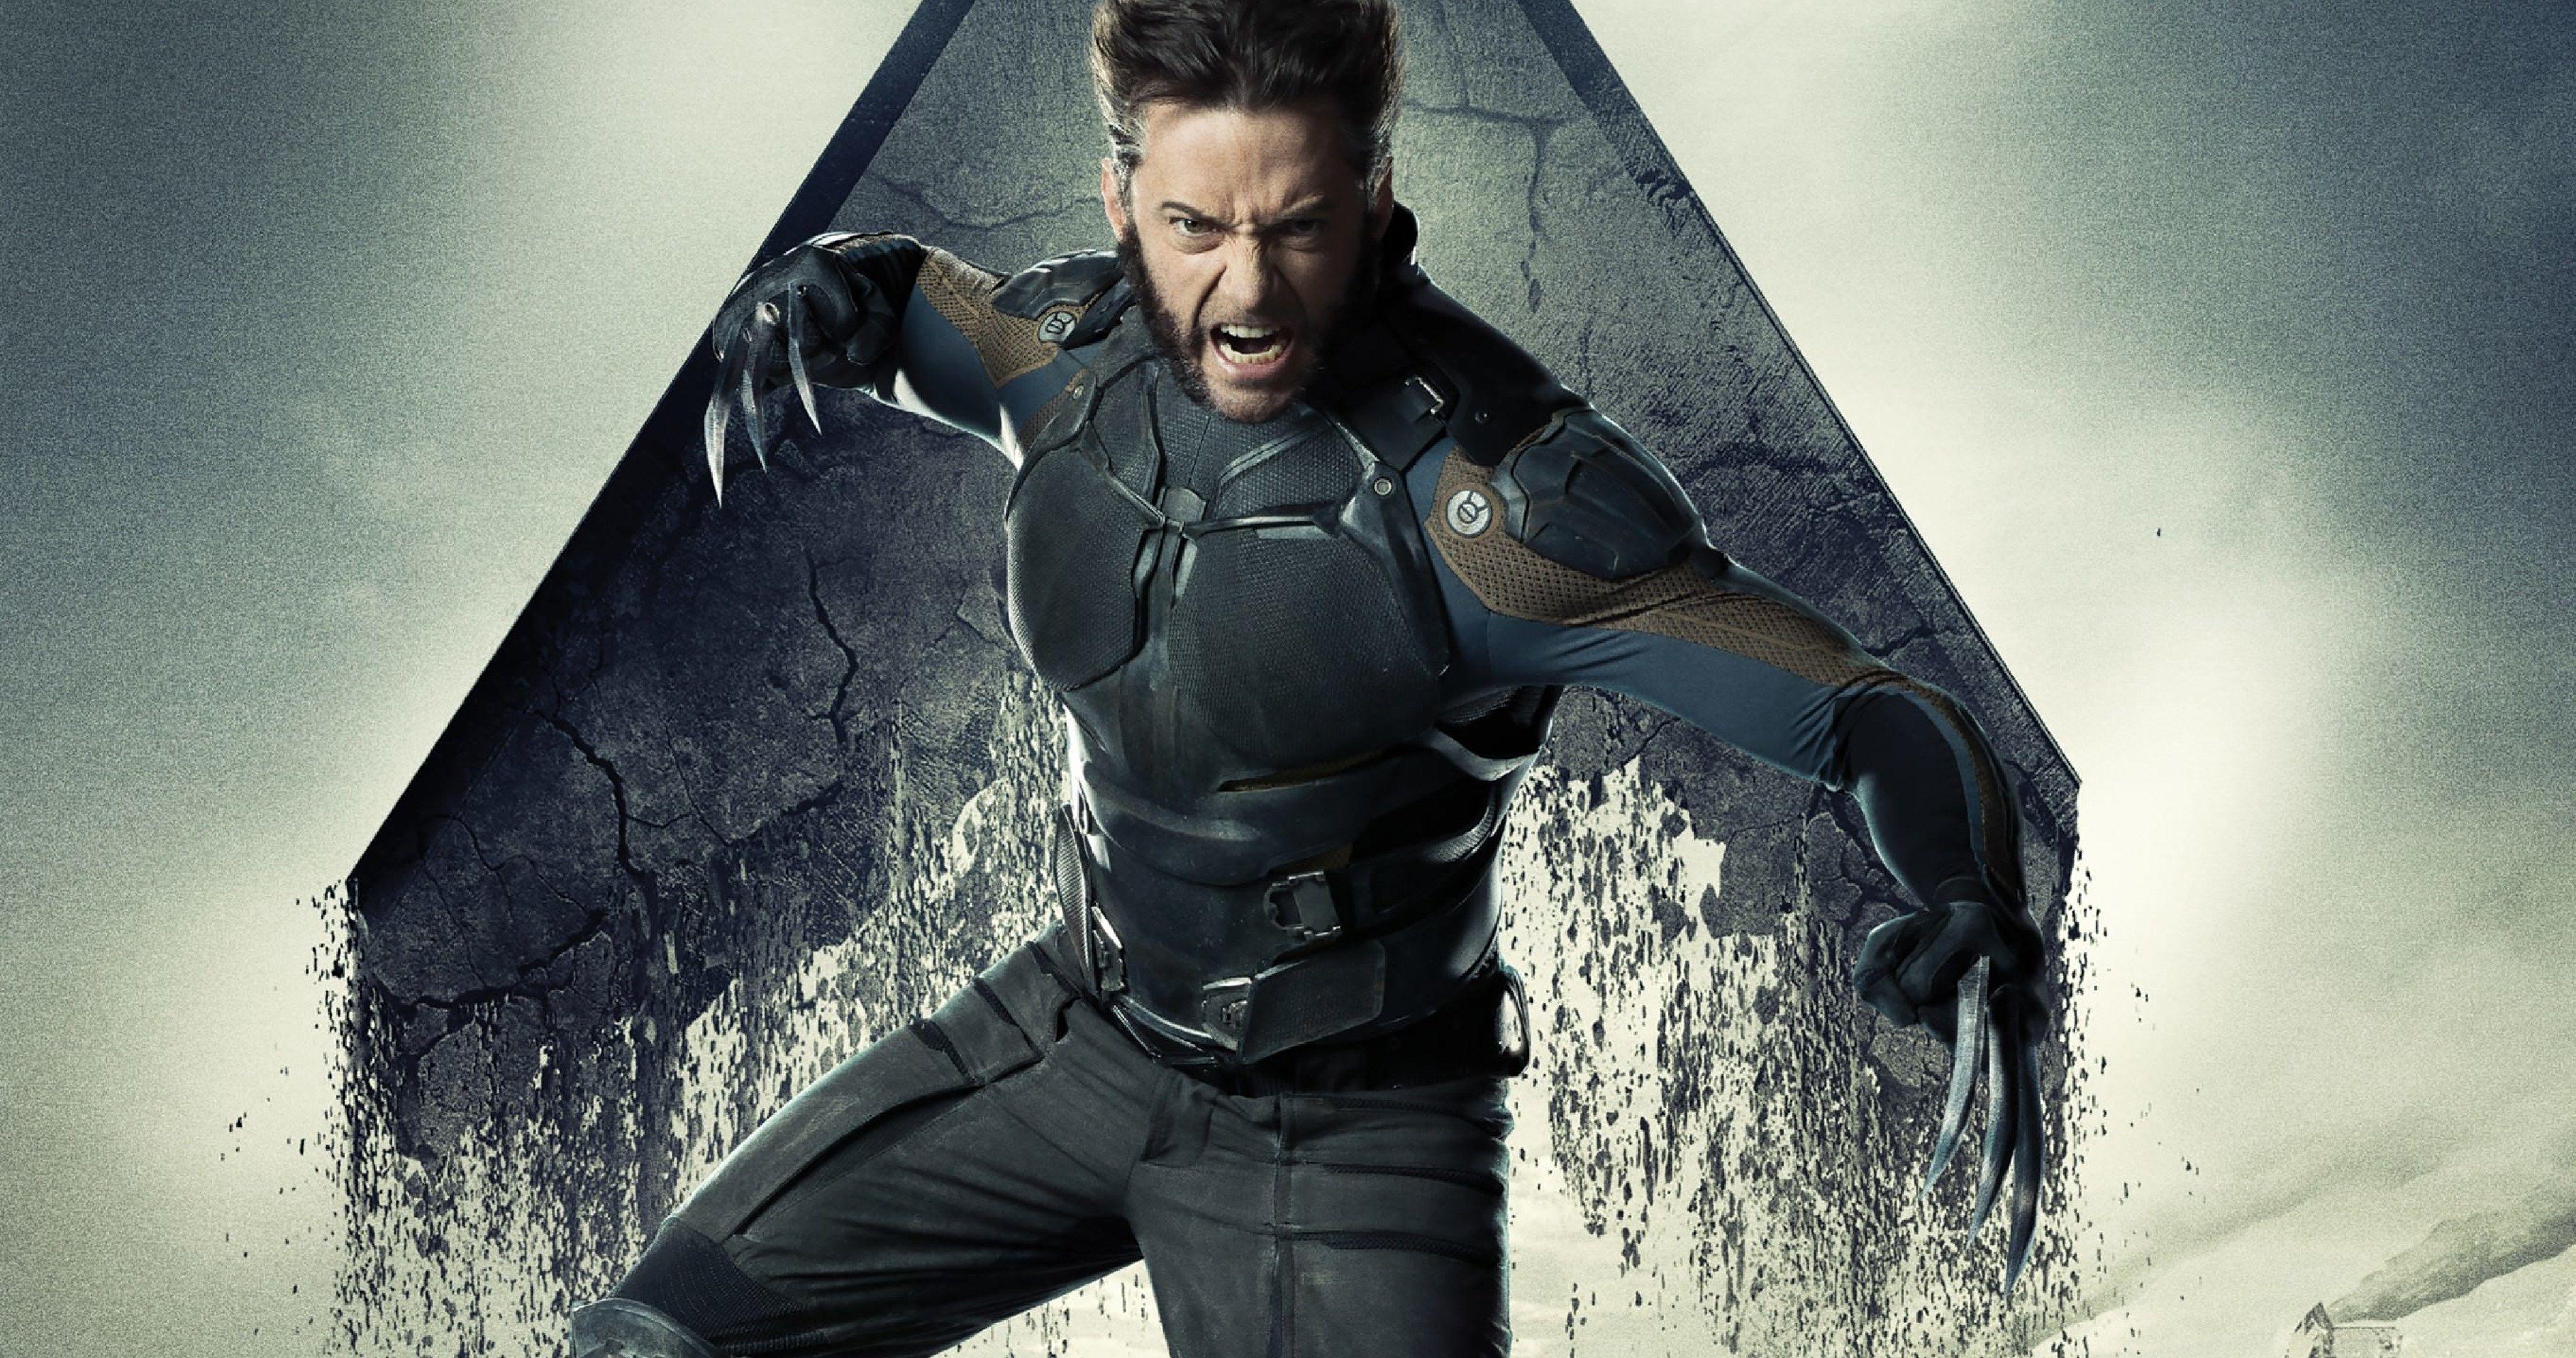 X Men Days Of Future Past 2014 4k Ultra Hd Wallpaper Days Of Future Past X Men Wolverine Movie